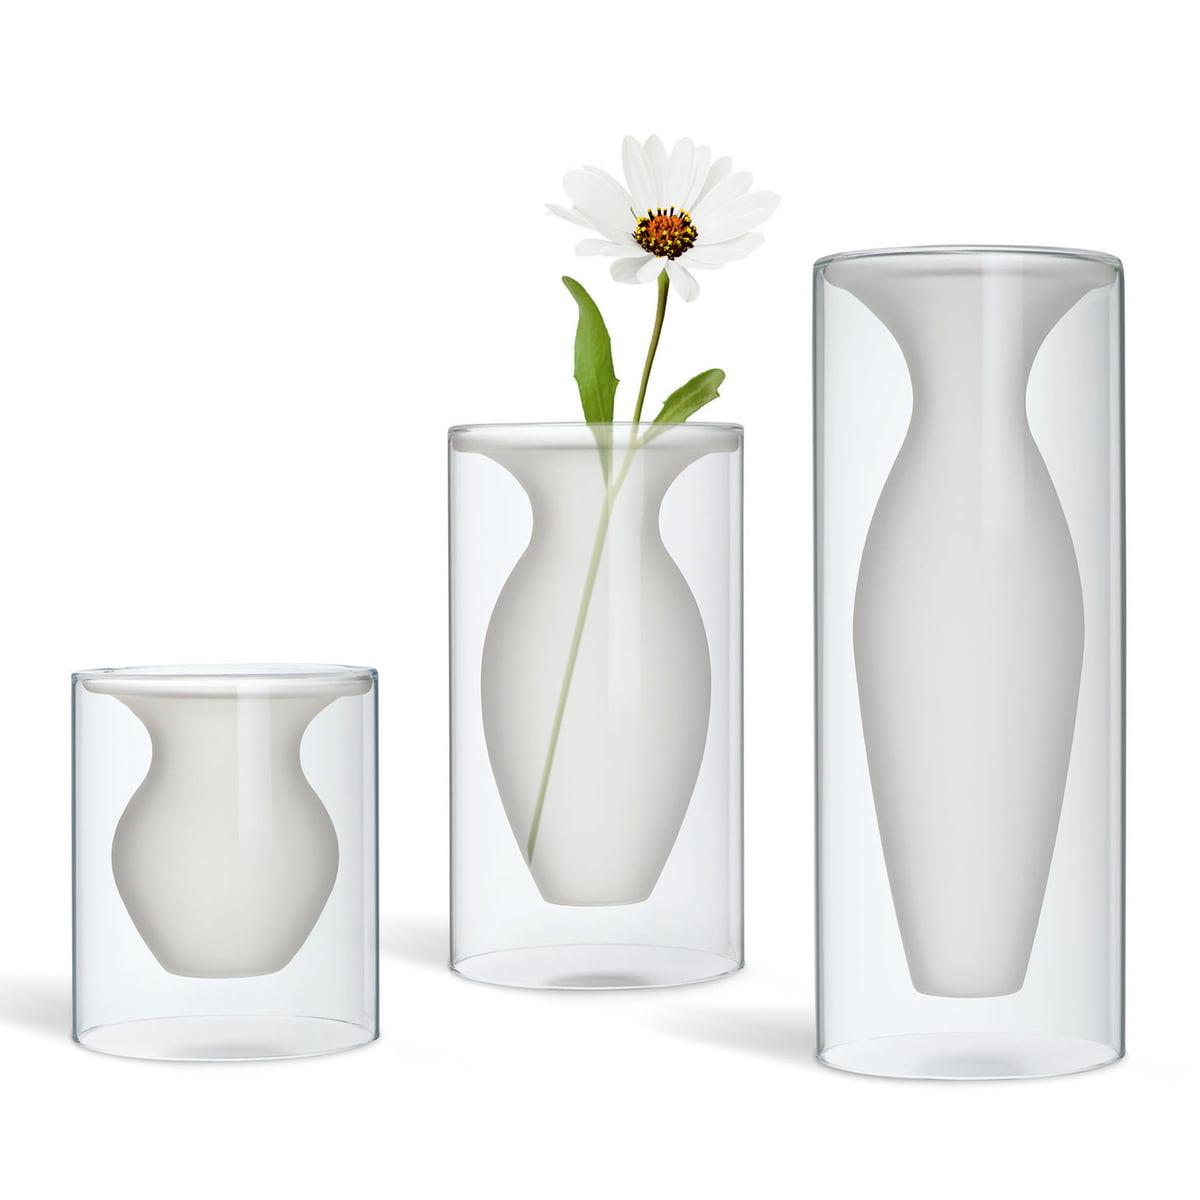 esmeralda vase von philippi im shop. Black Bedroom Furniture Sets. Home Design Ideas